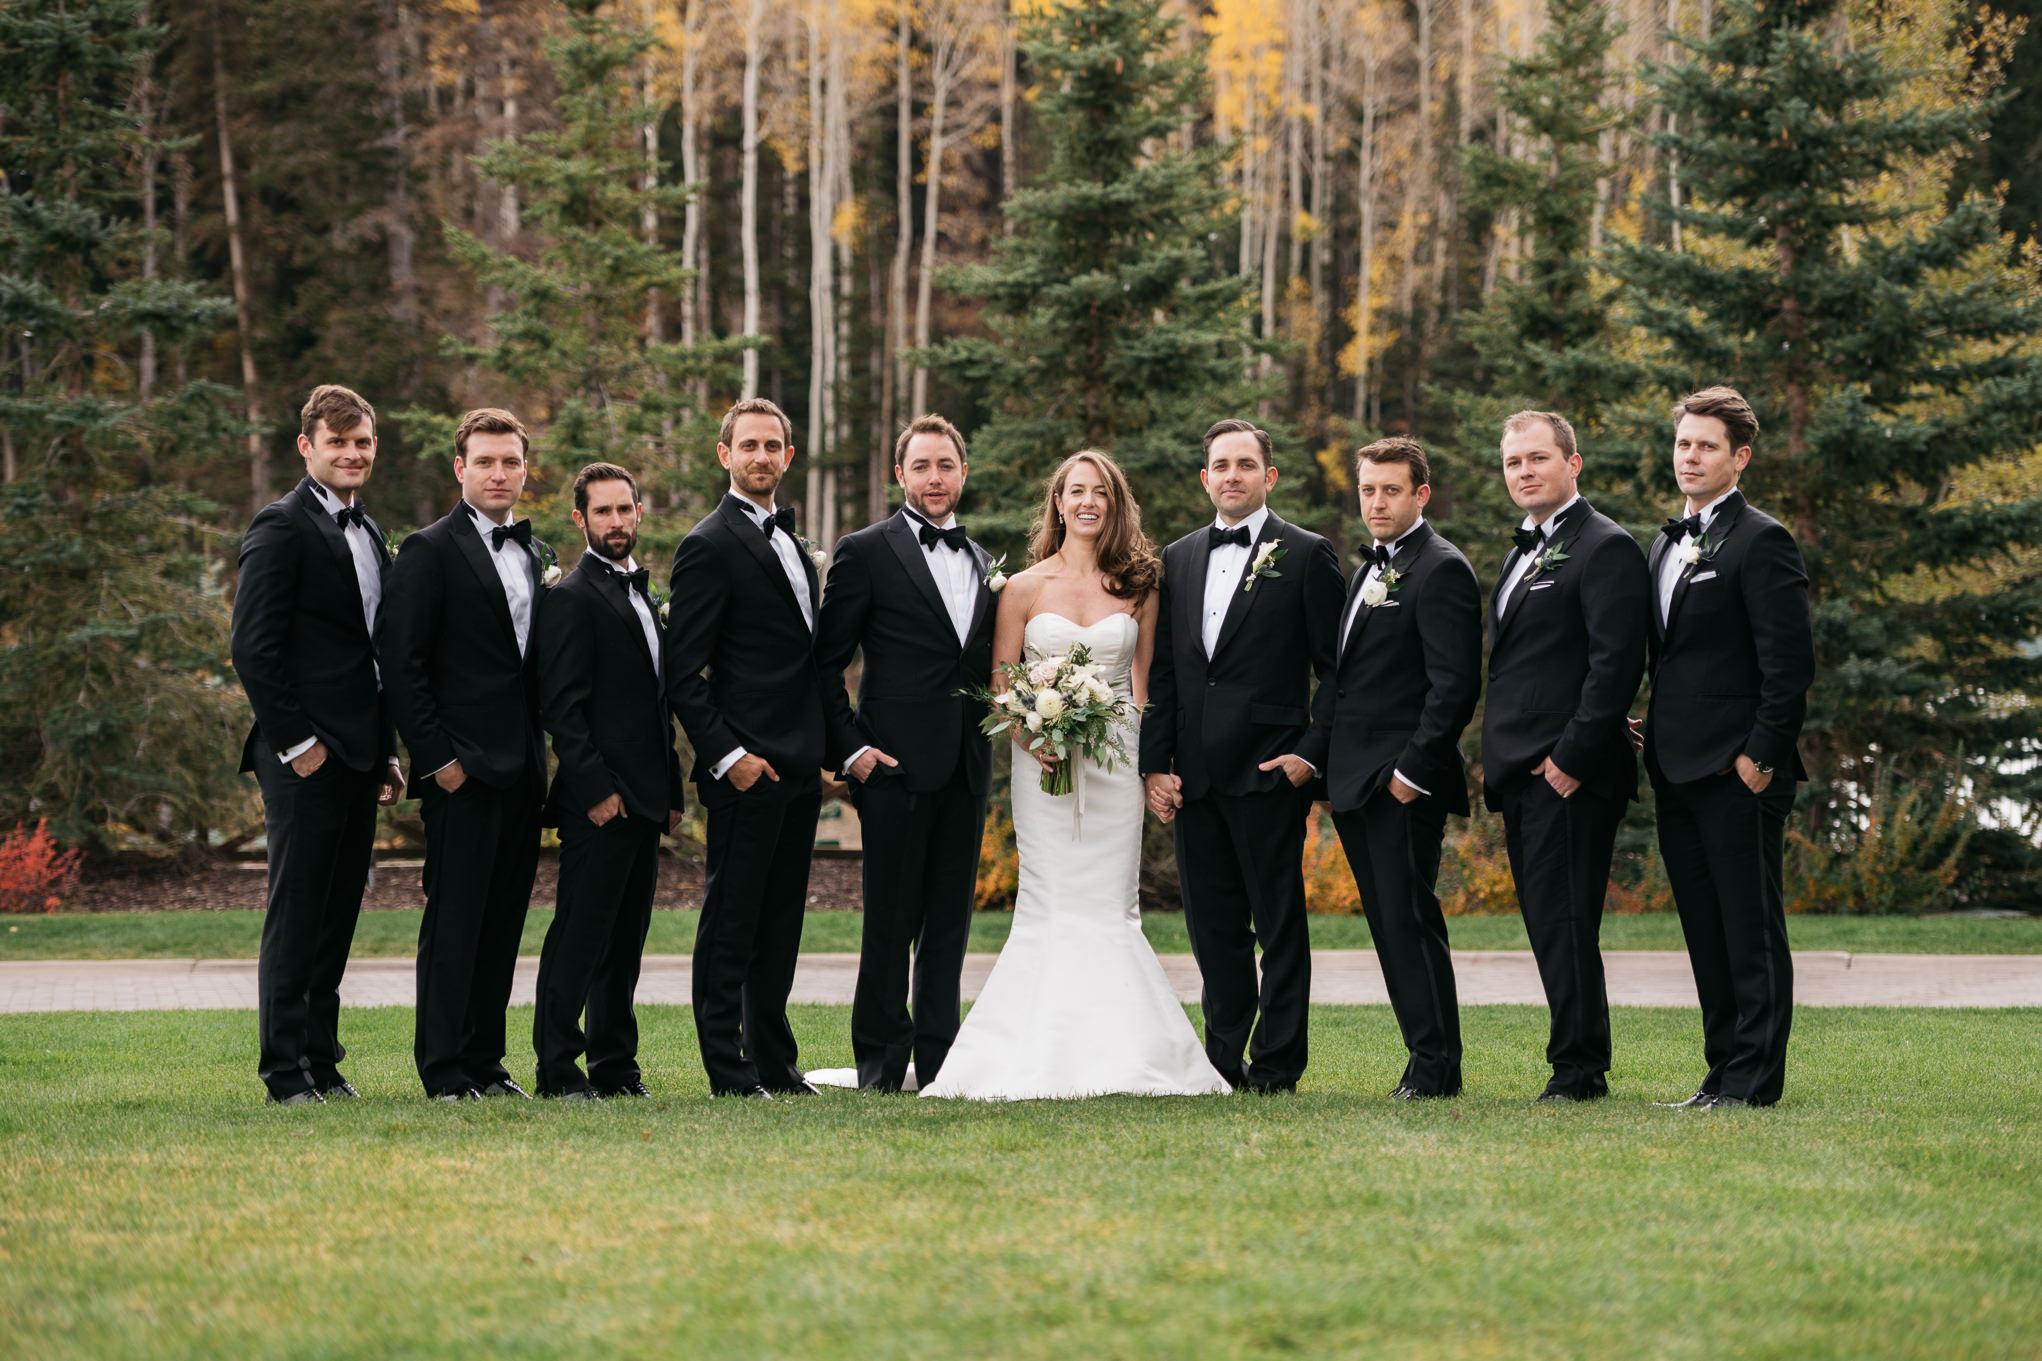 283_ONL_Mairin_Brian_Wedding_Trevor_Hooper_Photo.jpg